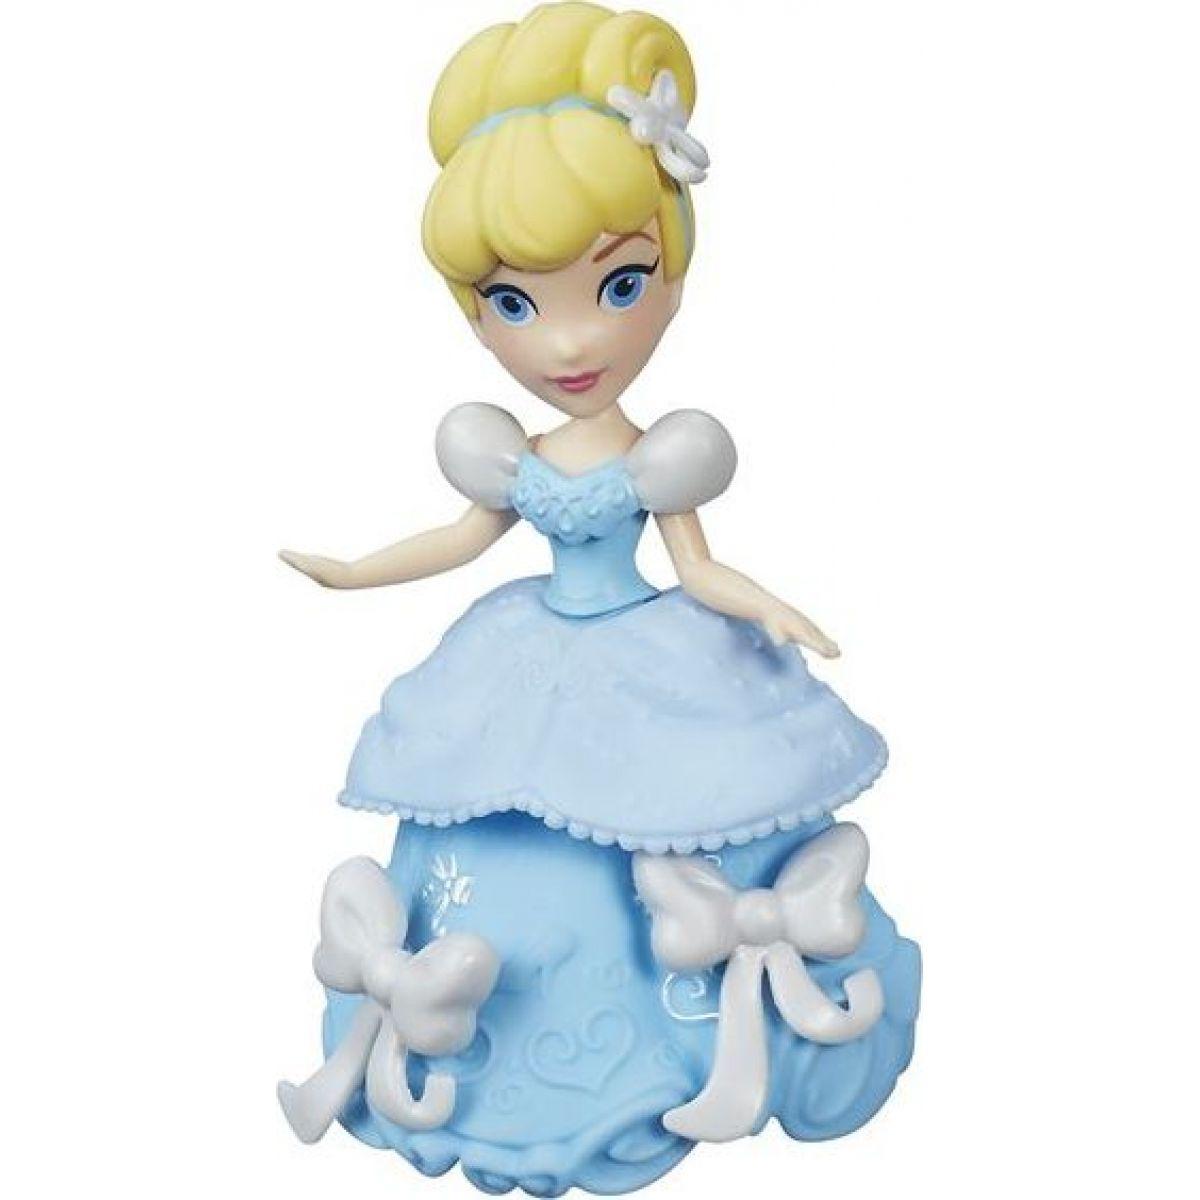 Hasbro Disney Princess Mini panenka - Popelka B5324